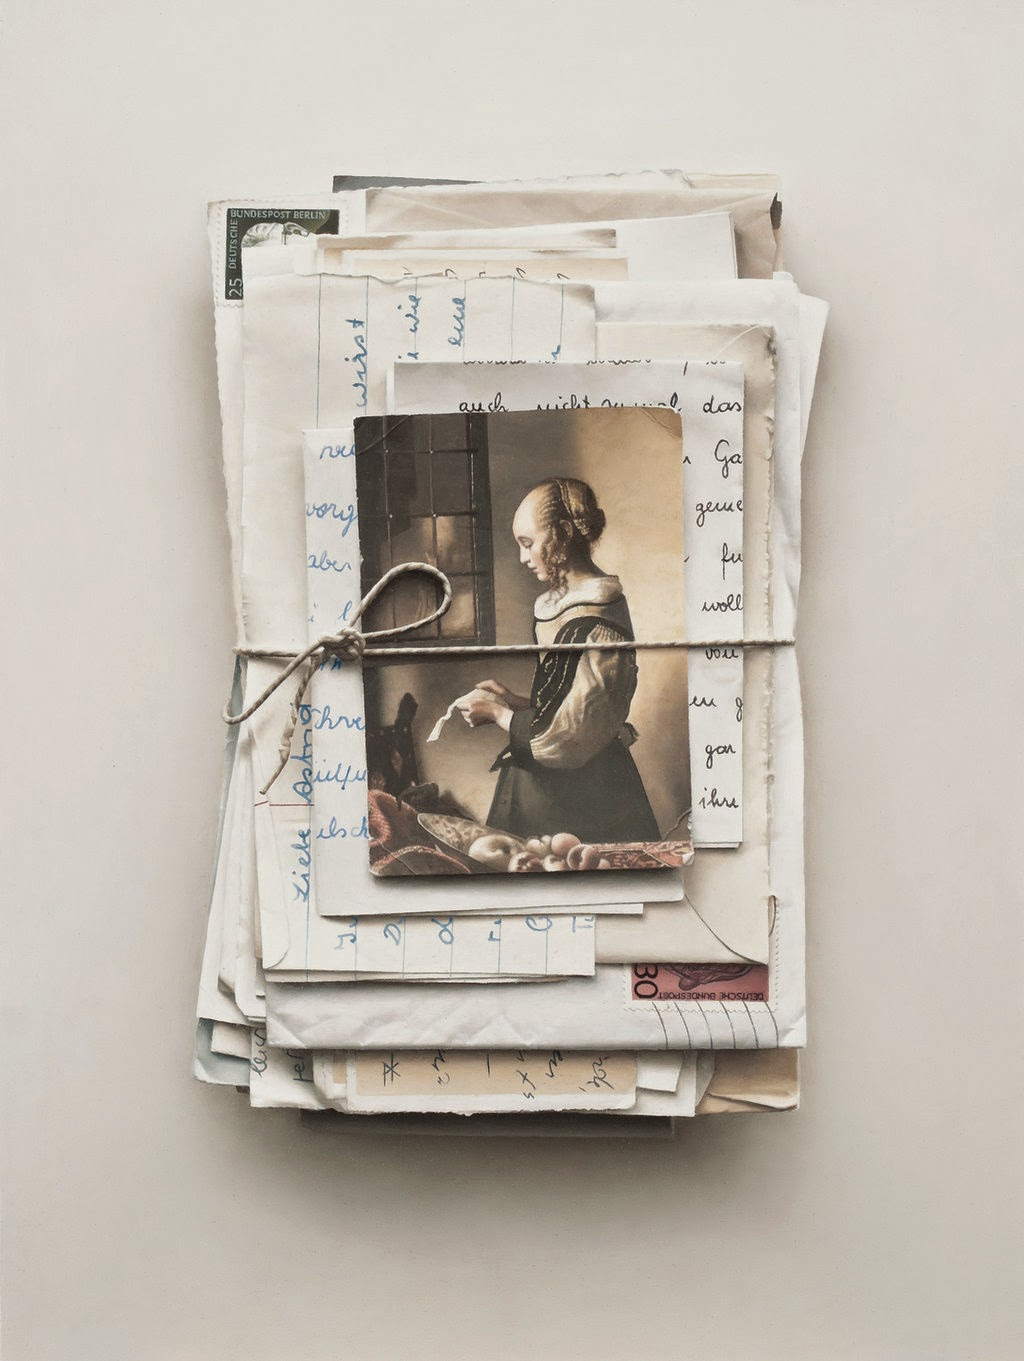 19-Letters-II-Patrick-Kramer-Hyper-Realistic-Paintings-www-designstack-co